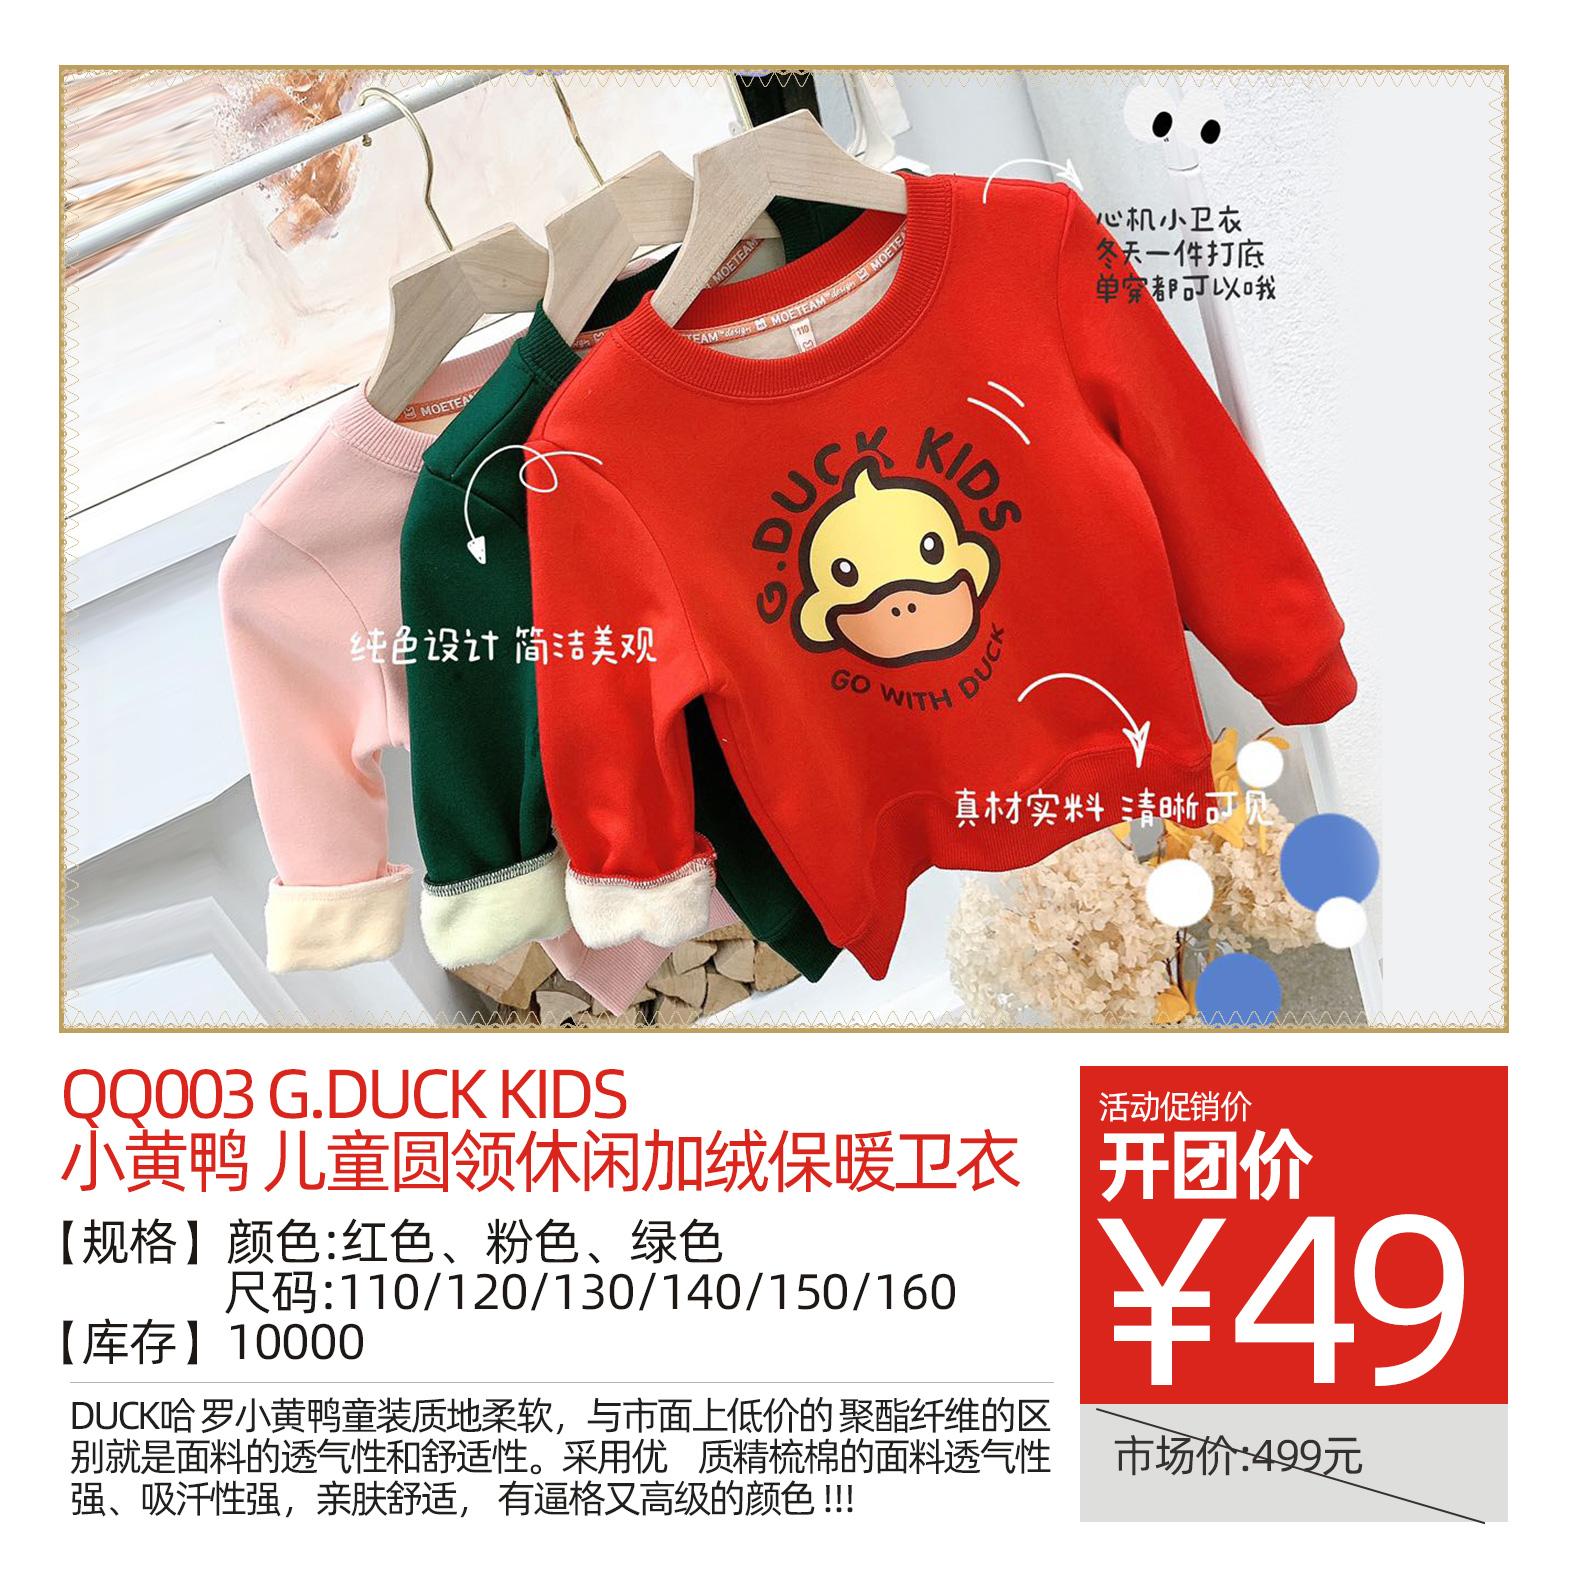 QQ003 G.DUCK KIDS 小黄鸭 儿童圆领休闲加绒保暖卫衣